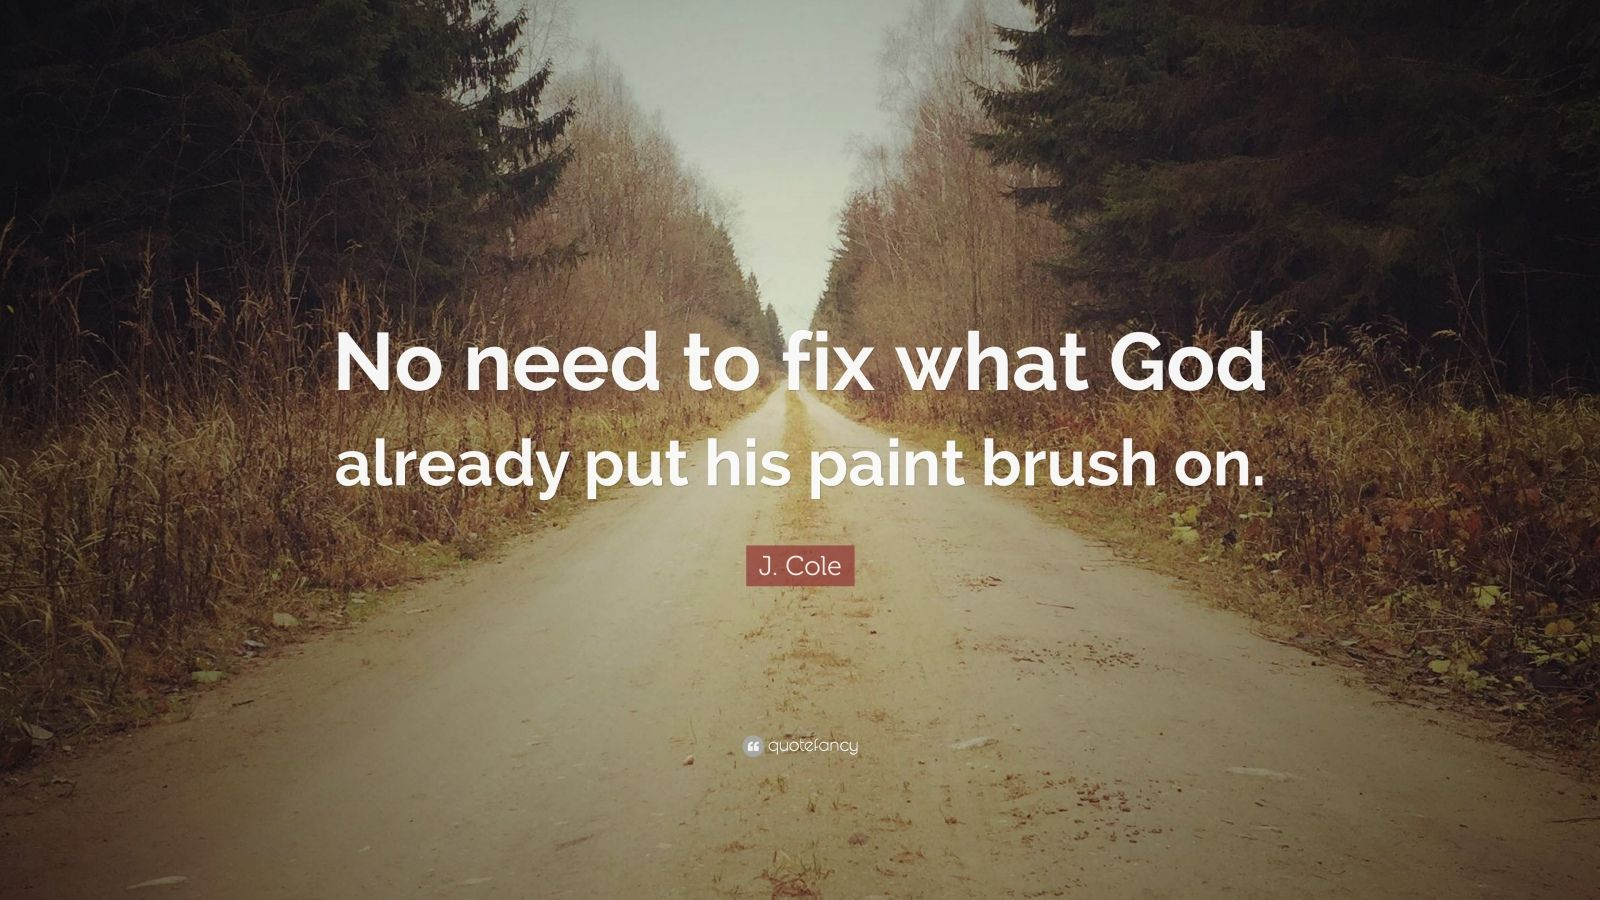 j cole quotes about god - photo #10